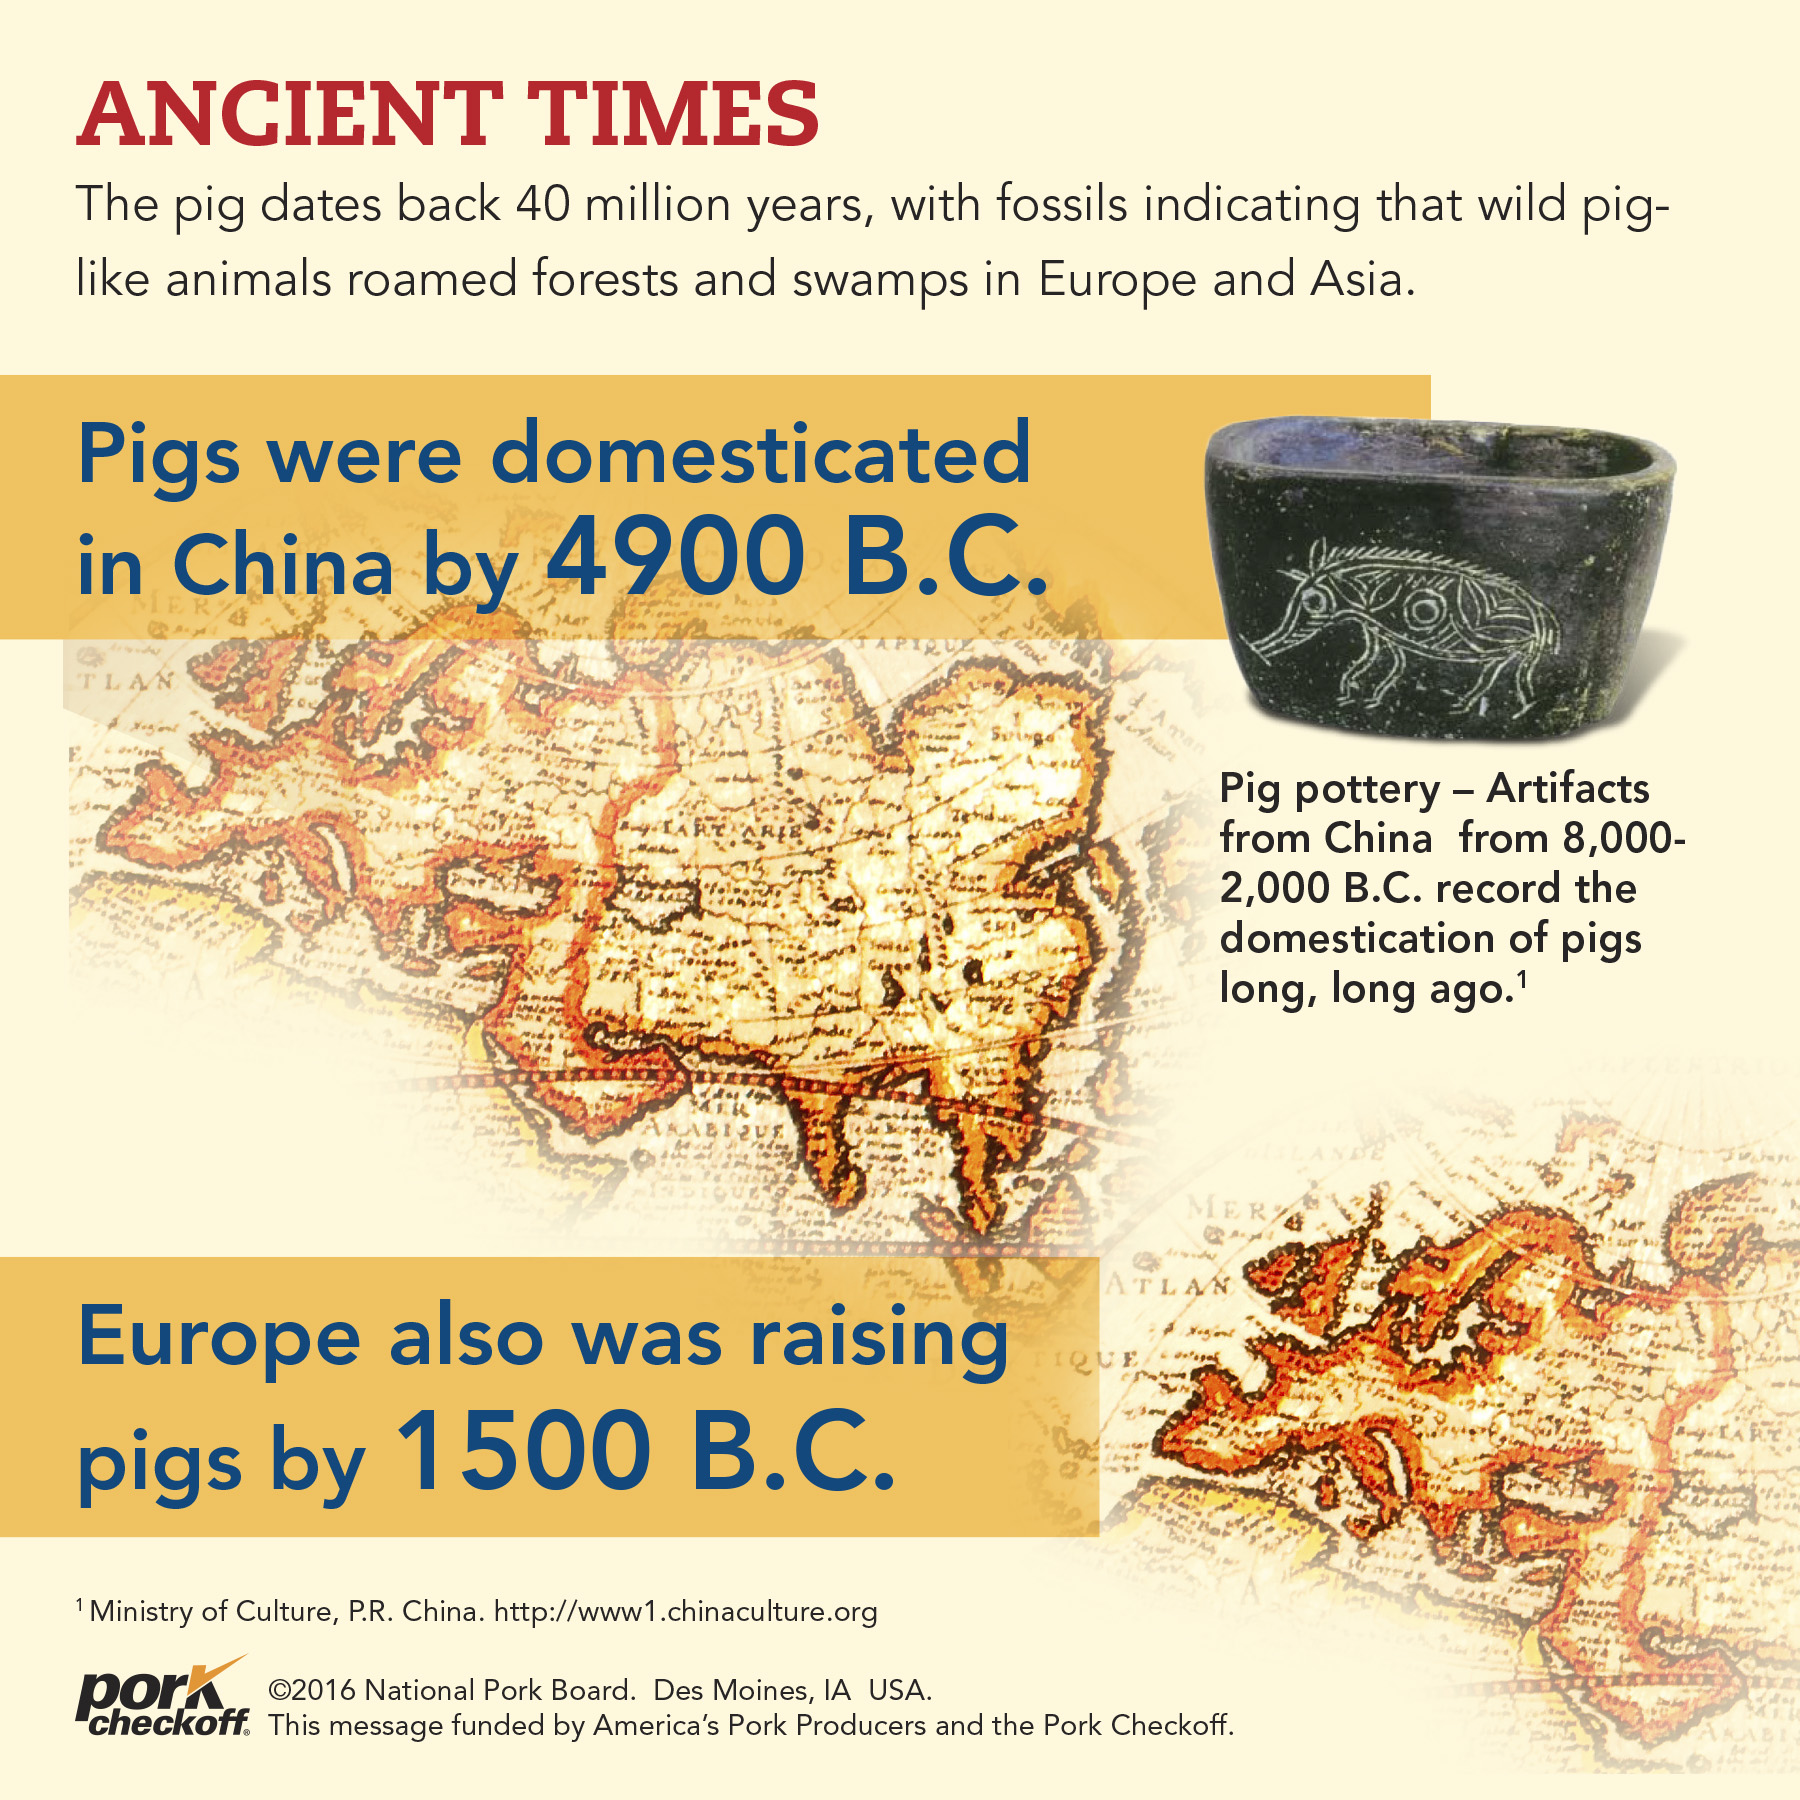 Fun Facts About Pork History - Pork Checkoff